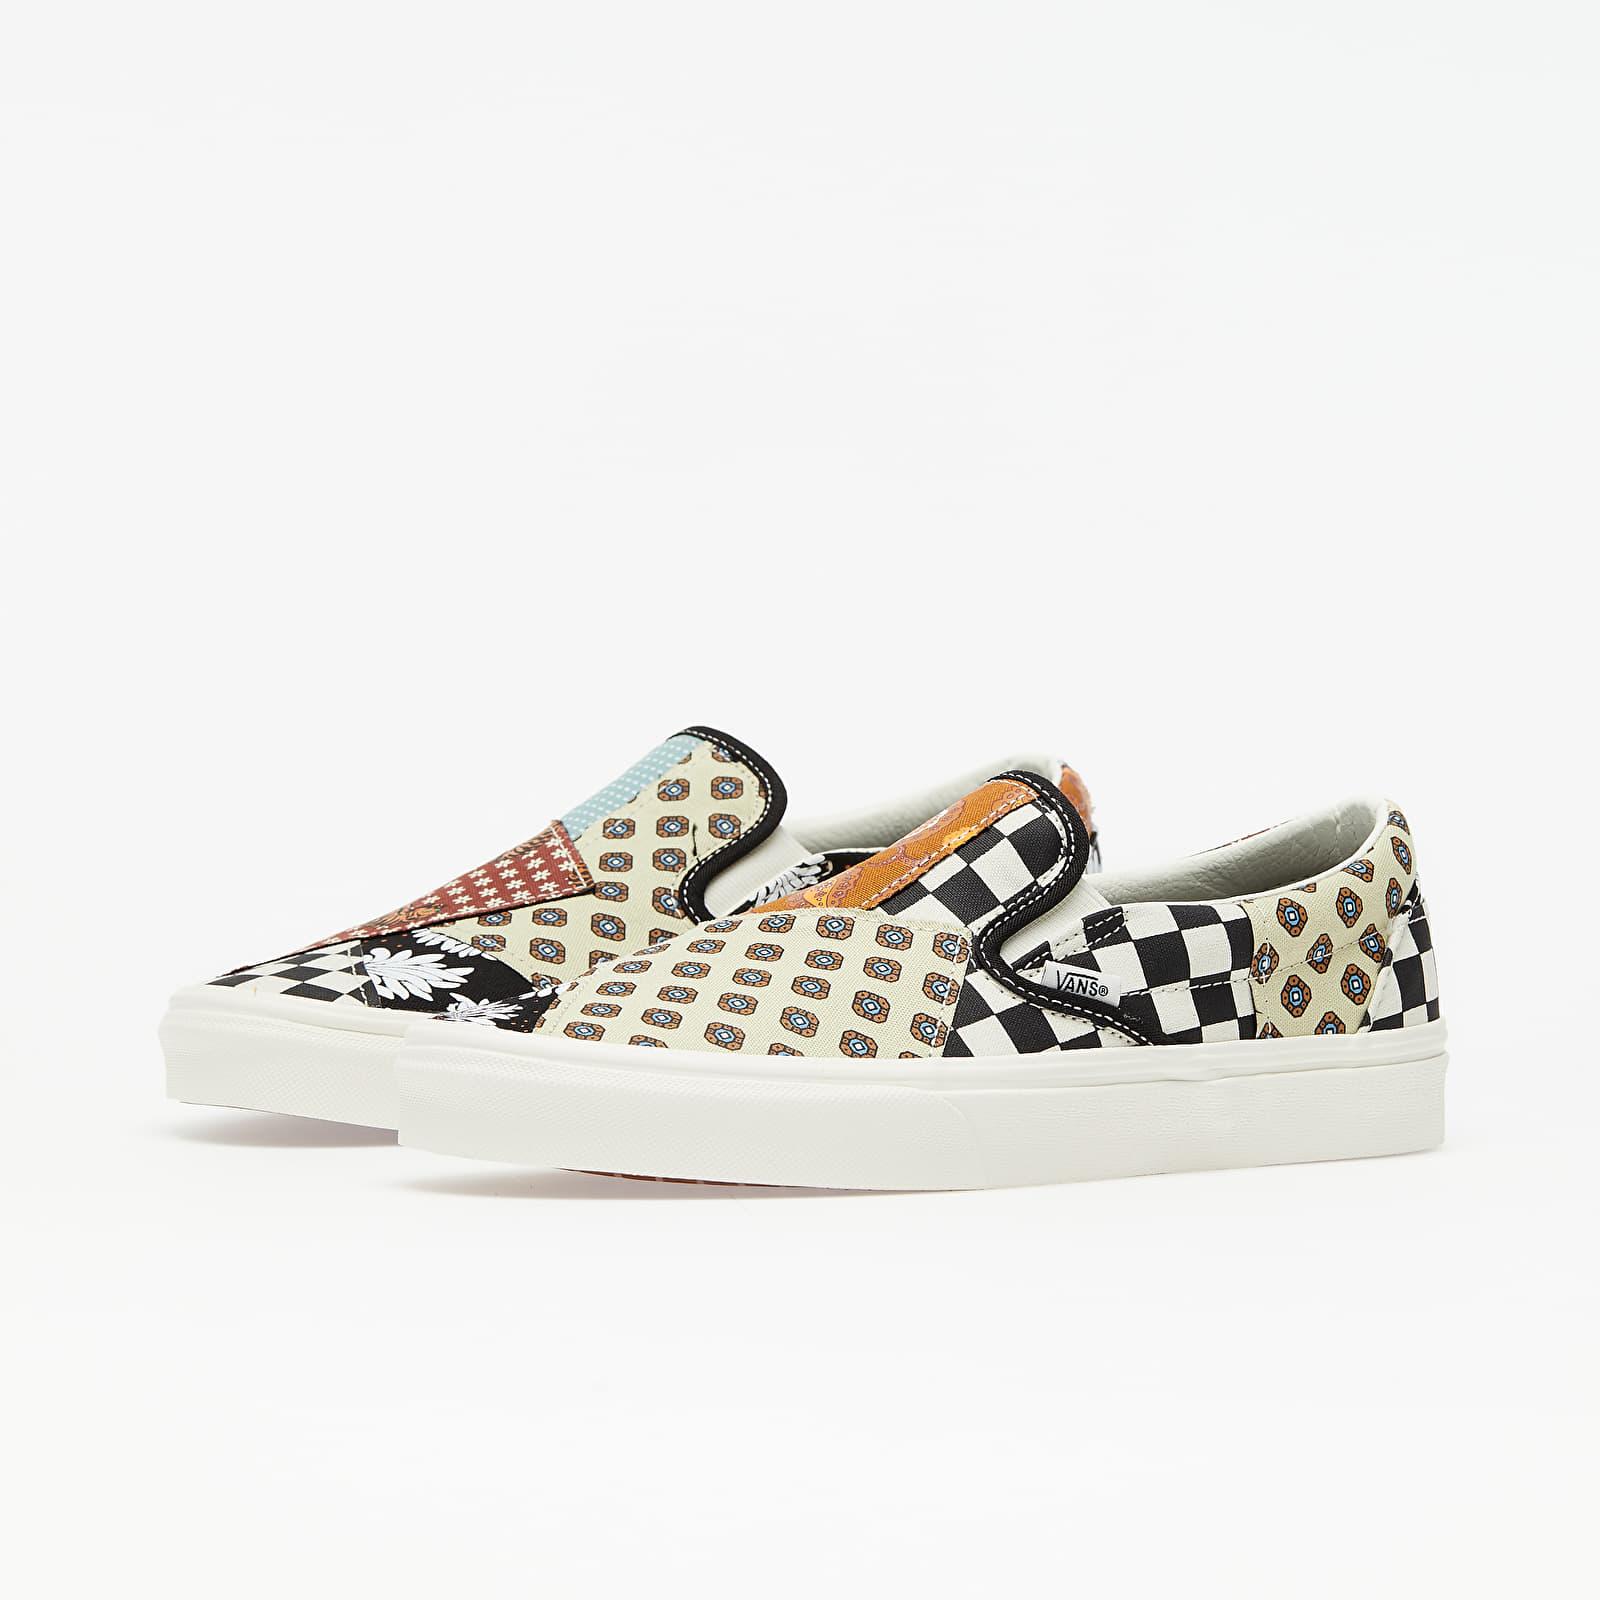 Men's shoes Vans Classic Slip-On (Tiger